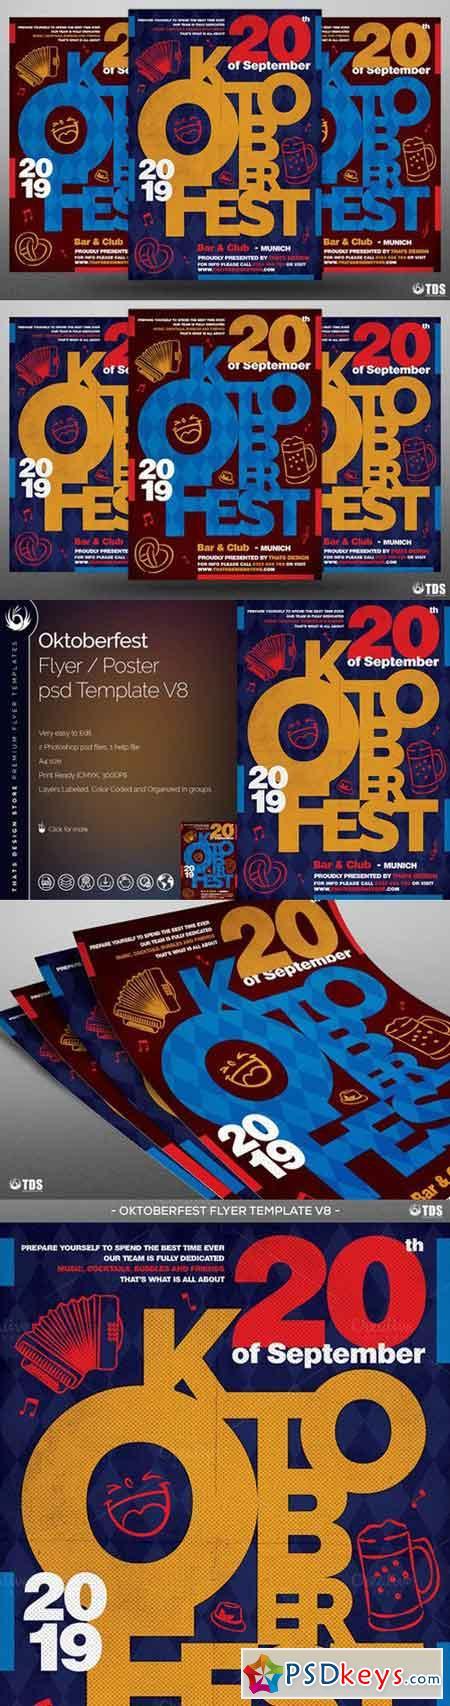 Oktoberfest Flyer Template V8 848404